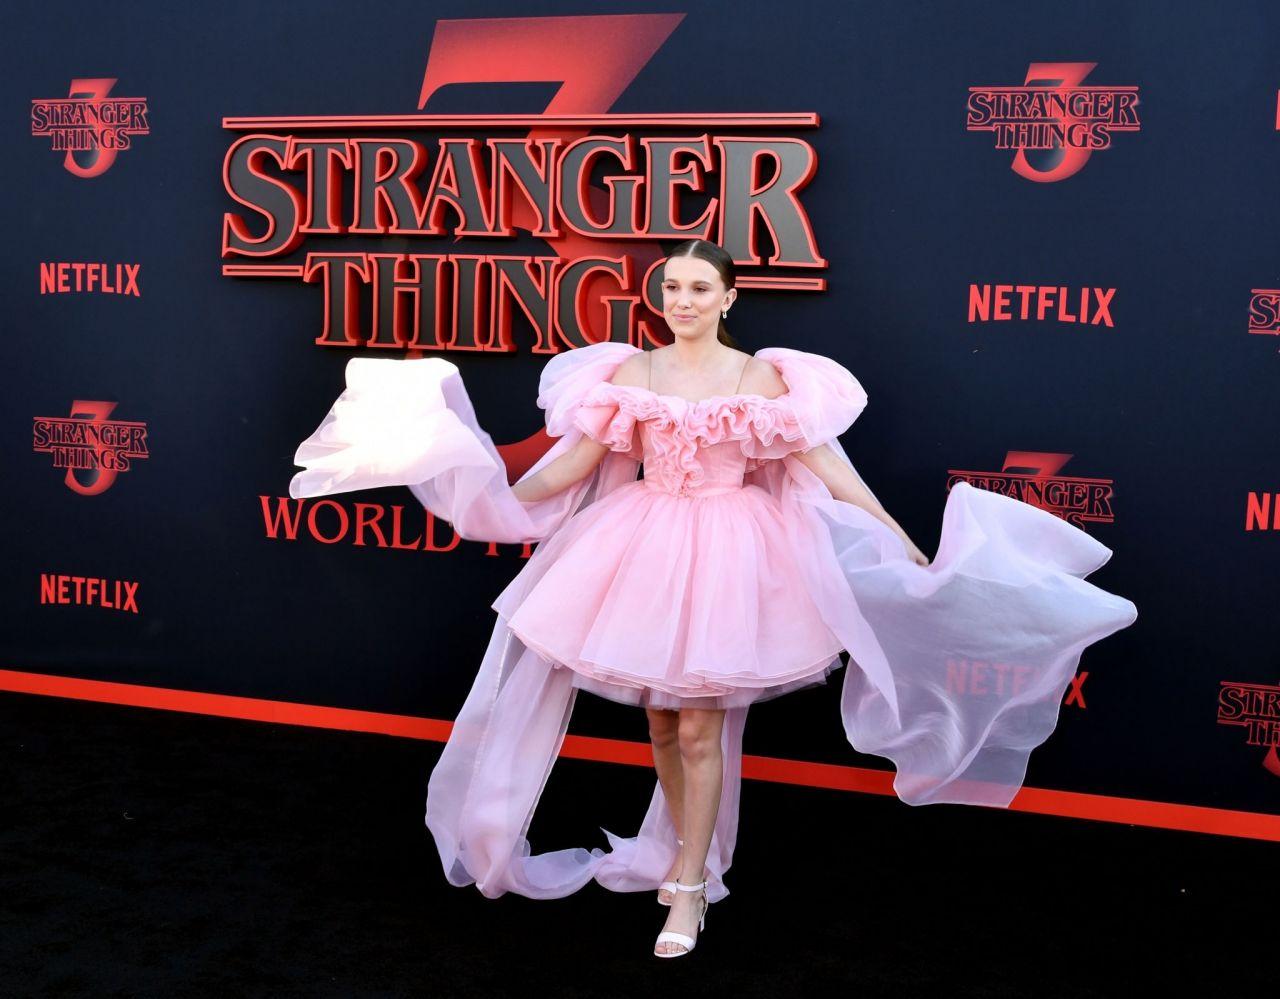 stranger things season 4 - photo #4